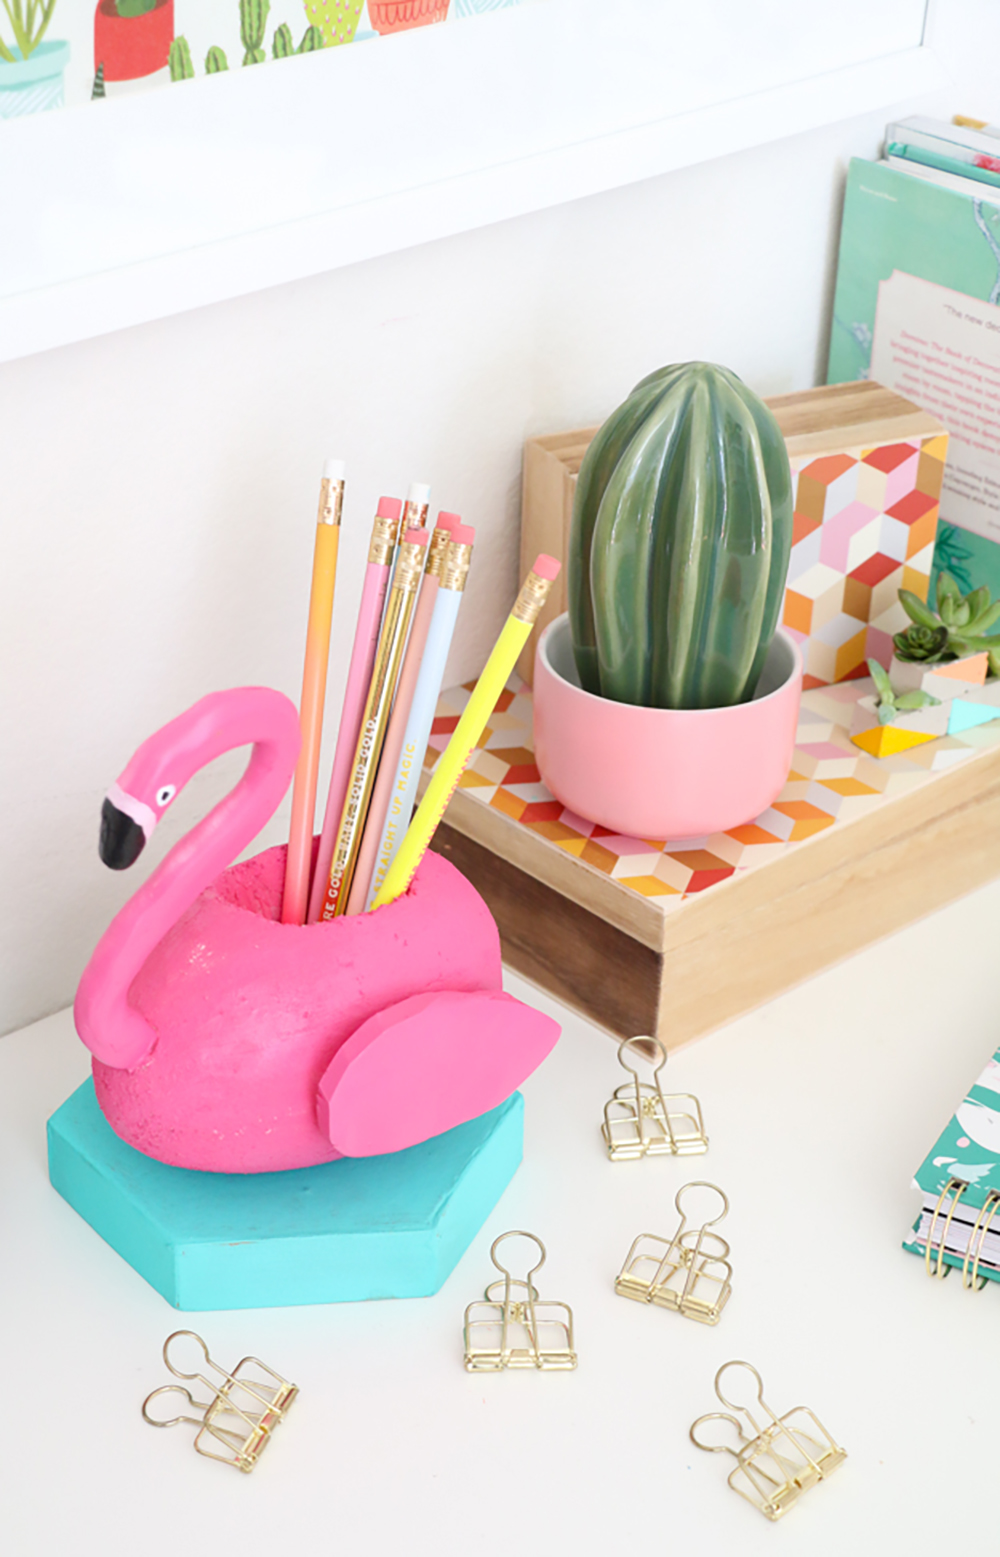 DIY Flamingo pencil holder - Decorate your home with flamingos | Aliz's Wonderland